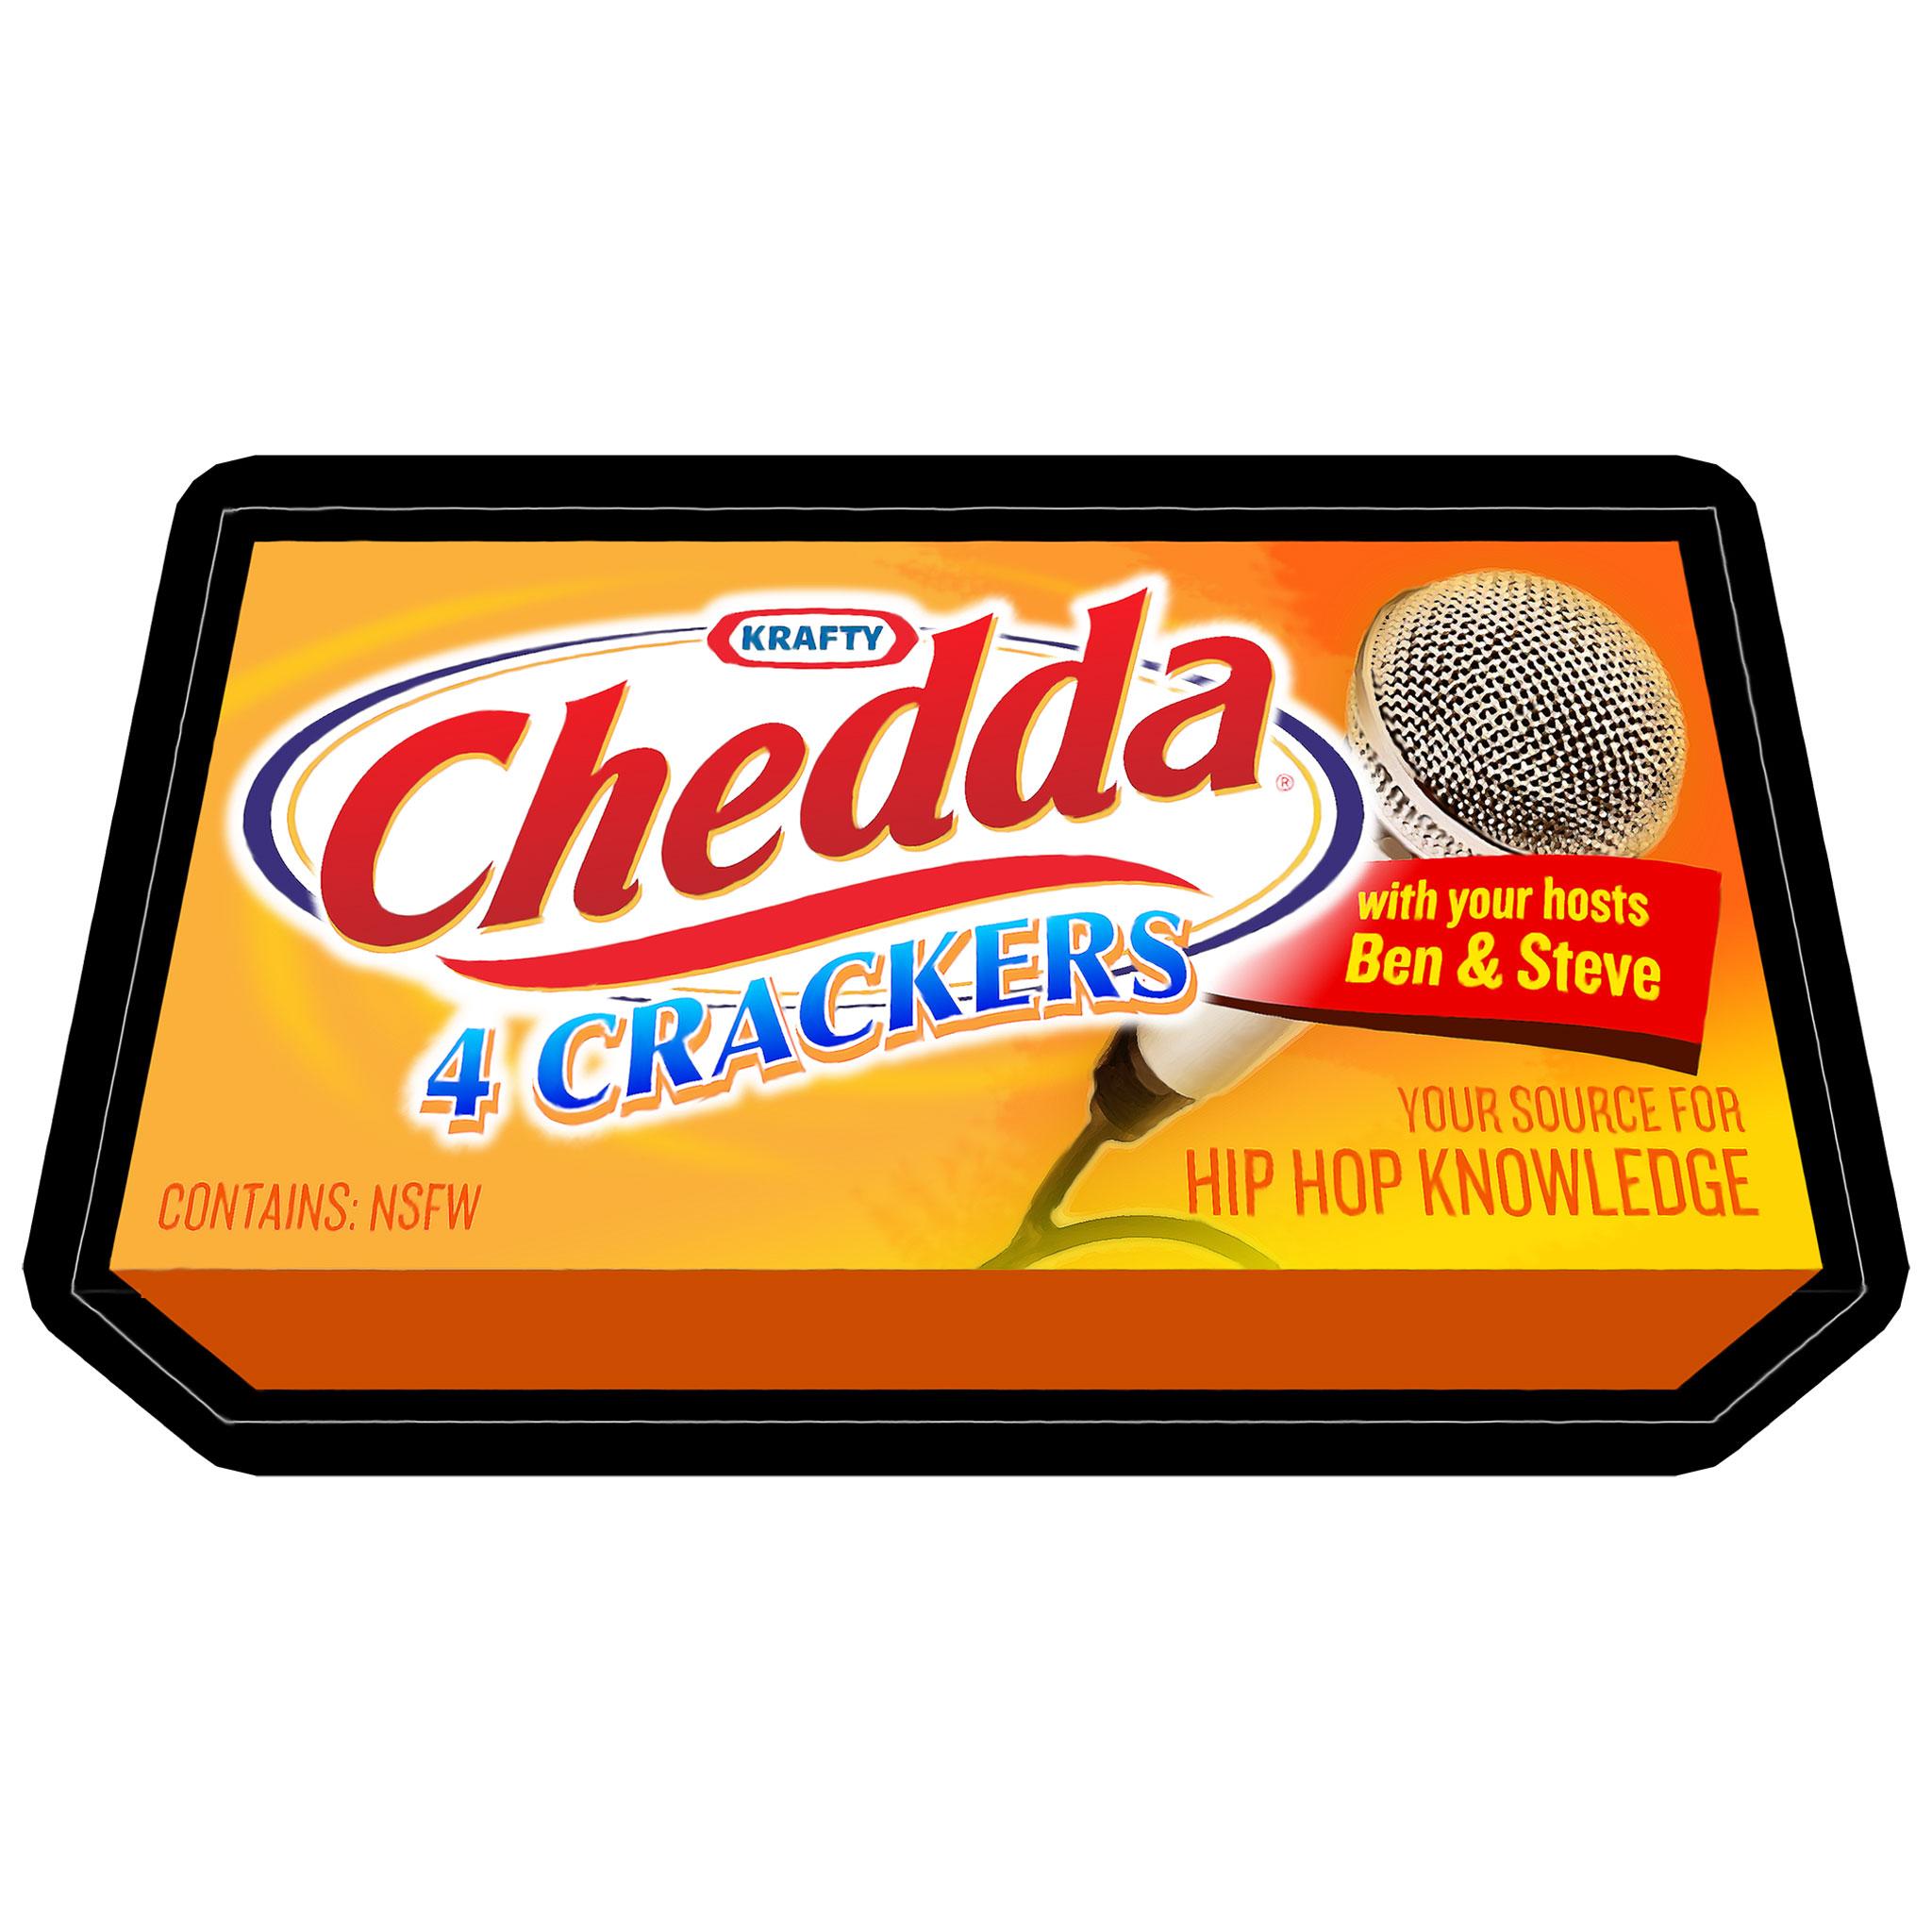 Chedda4Crackers